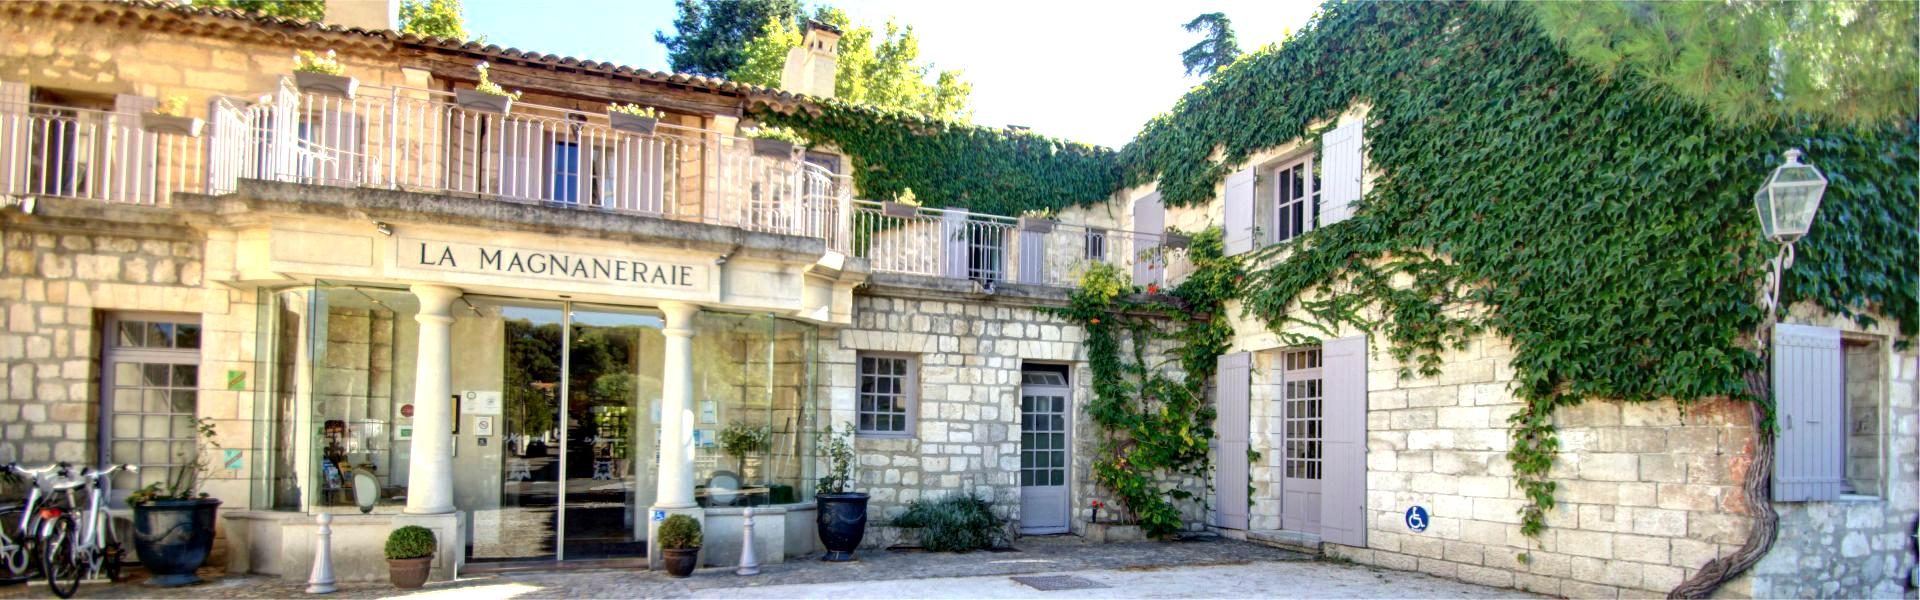 La façade du Najeti Hôtel la Magnaneraie